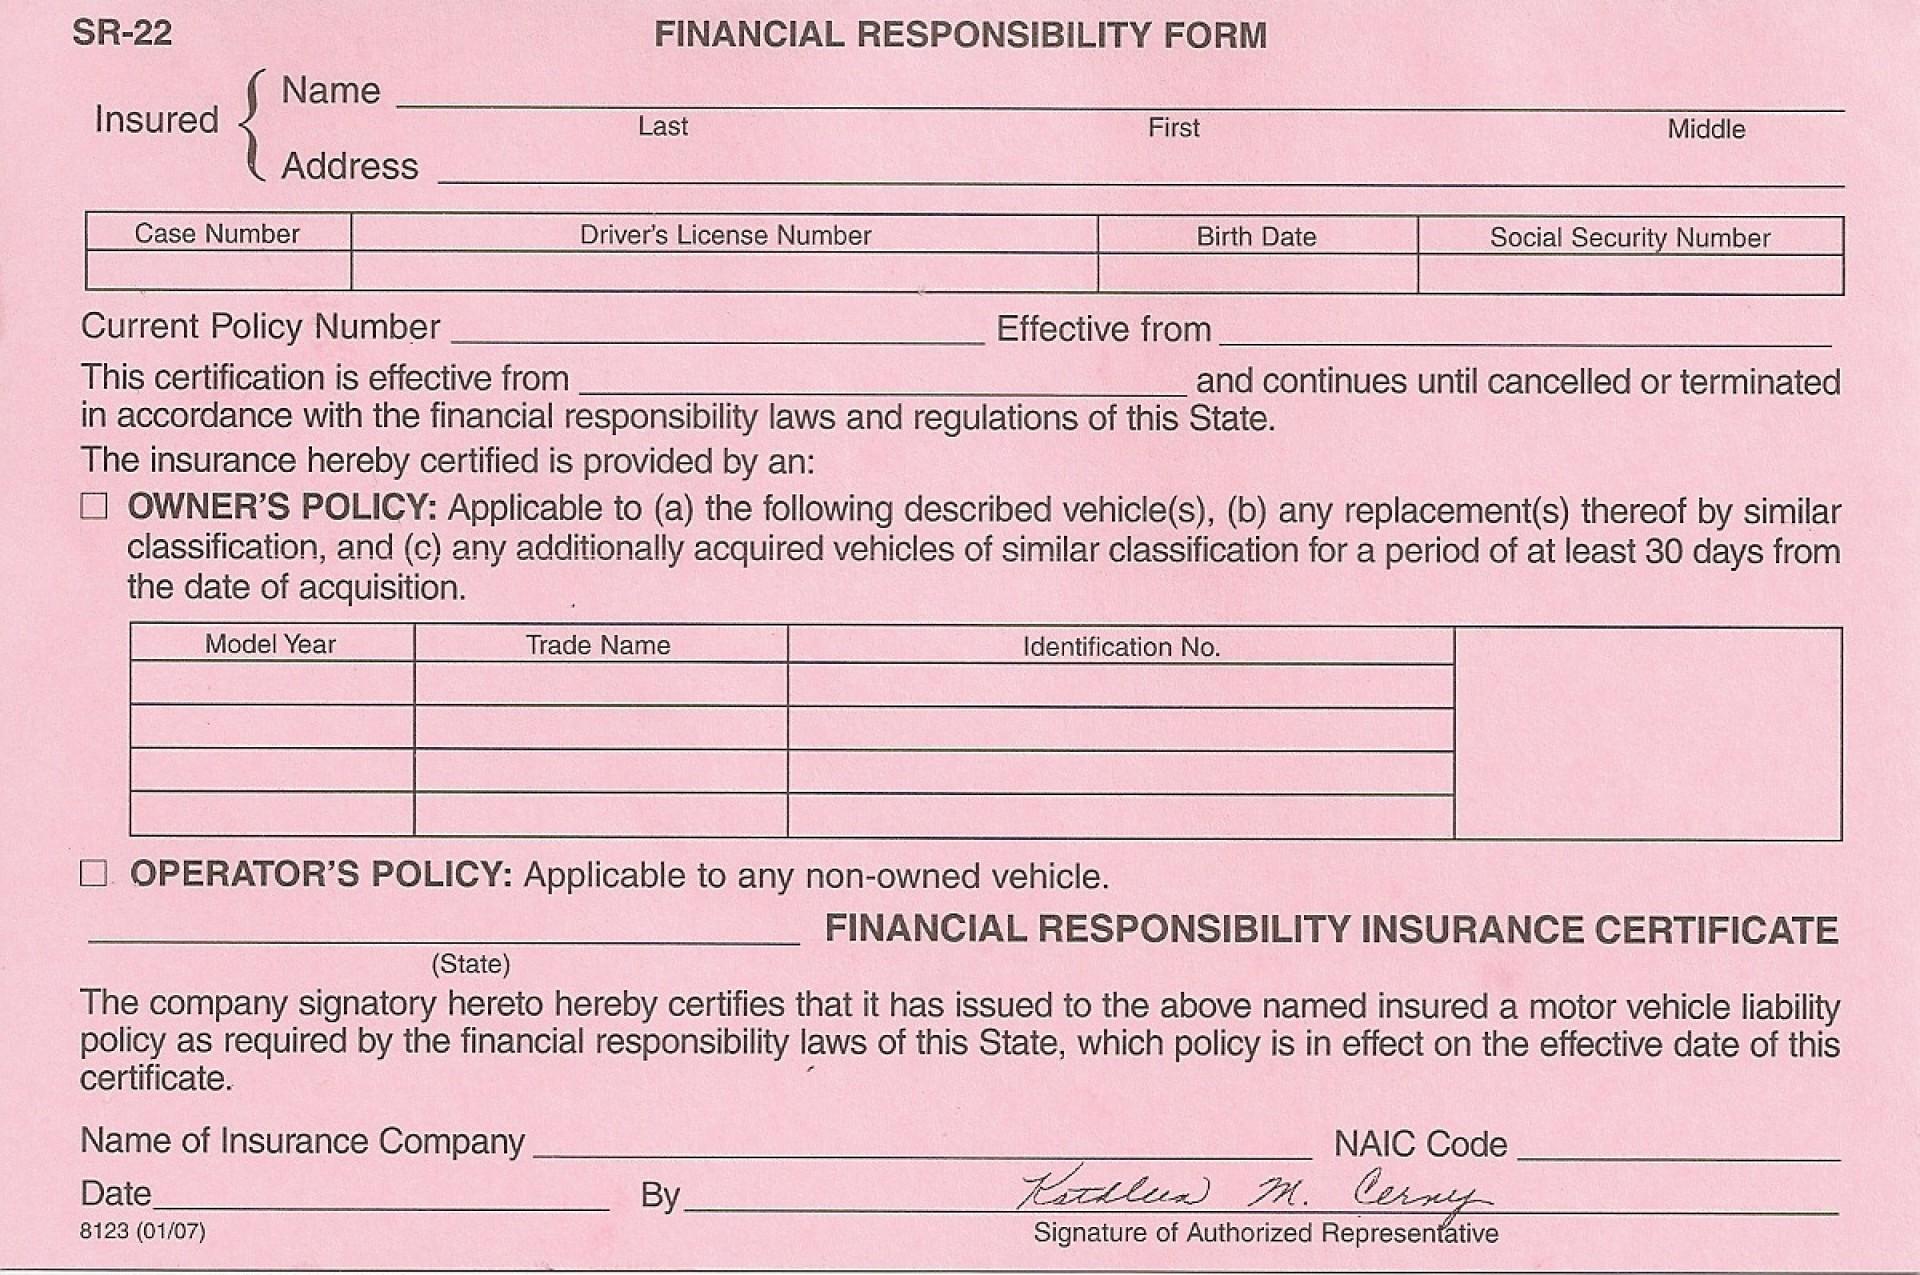 Sr22 Insurance Form Florida | Universal Network